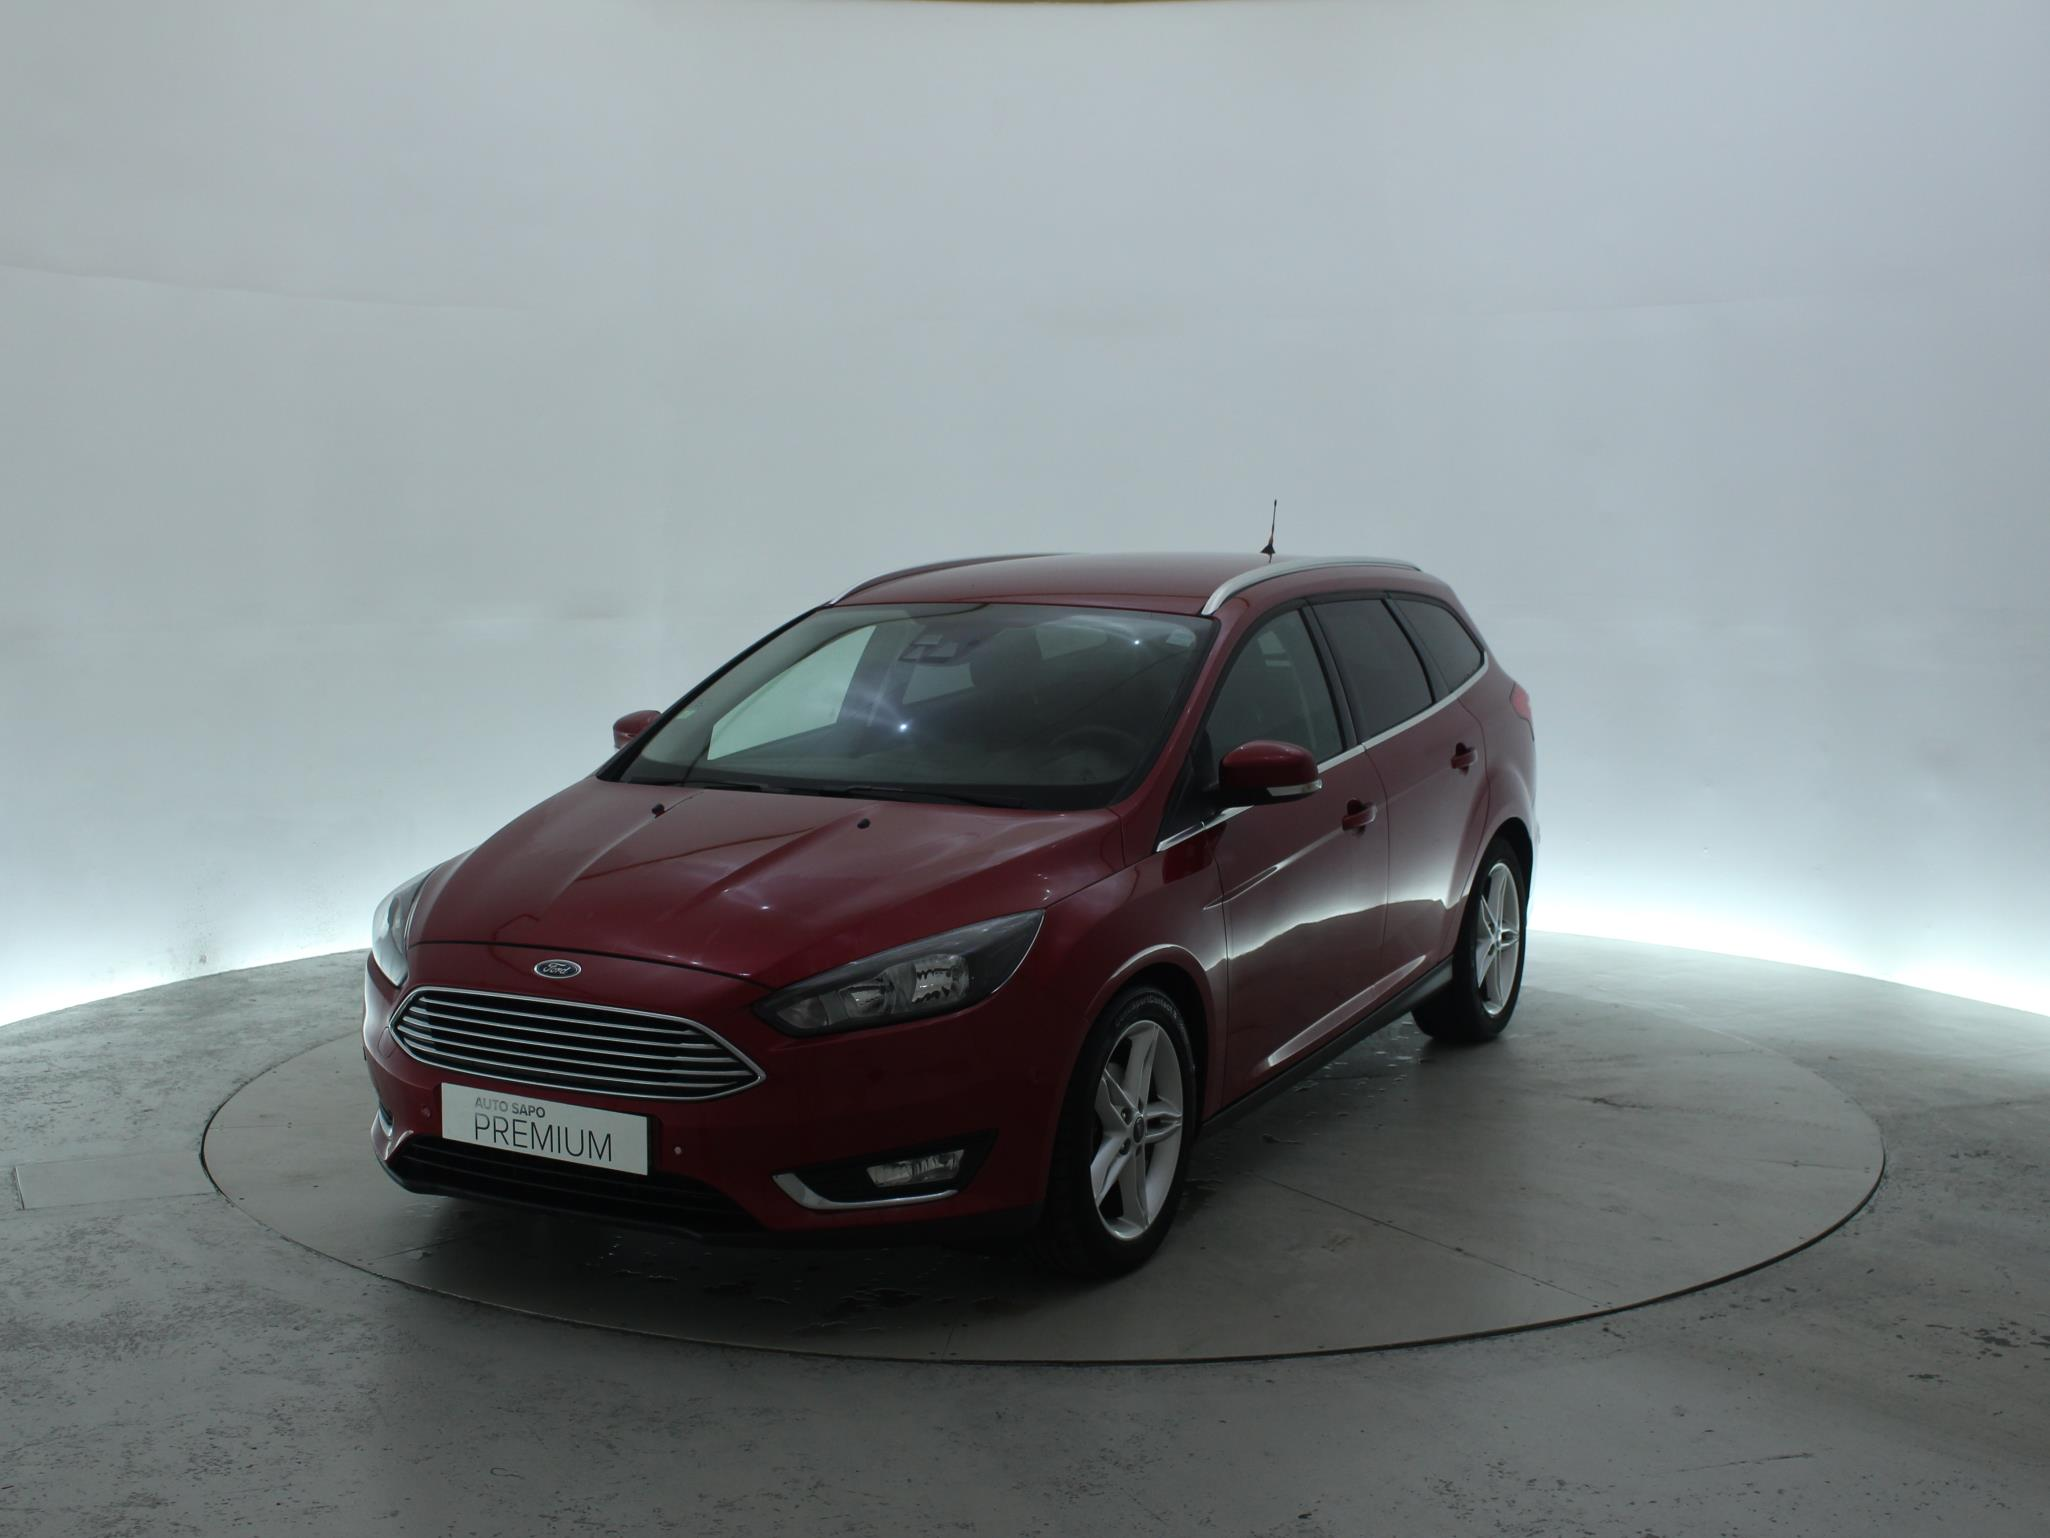 Ford Focus St.1.0 SCTi Titanium (125cv) (5p) (2014 a presente)